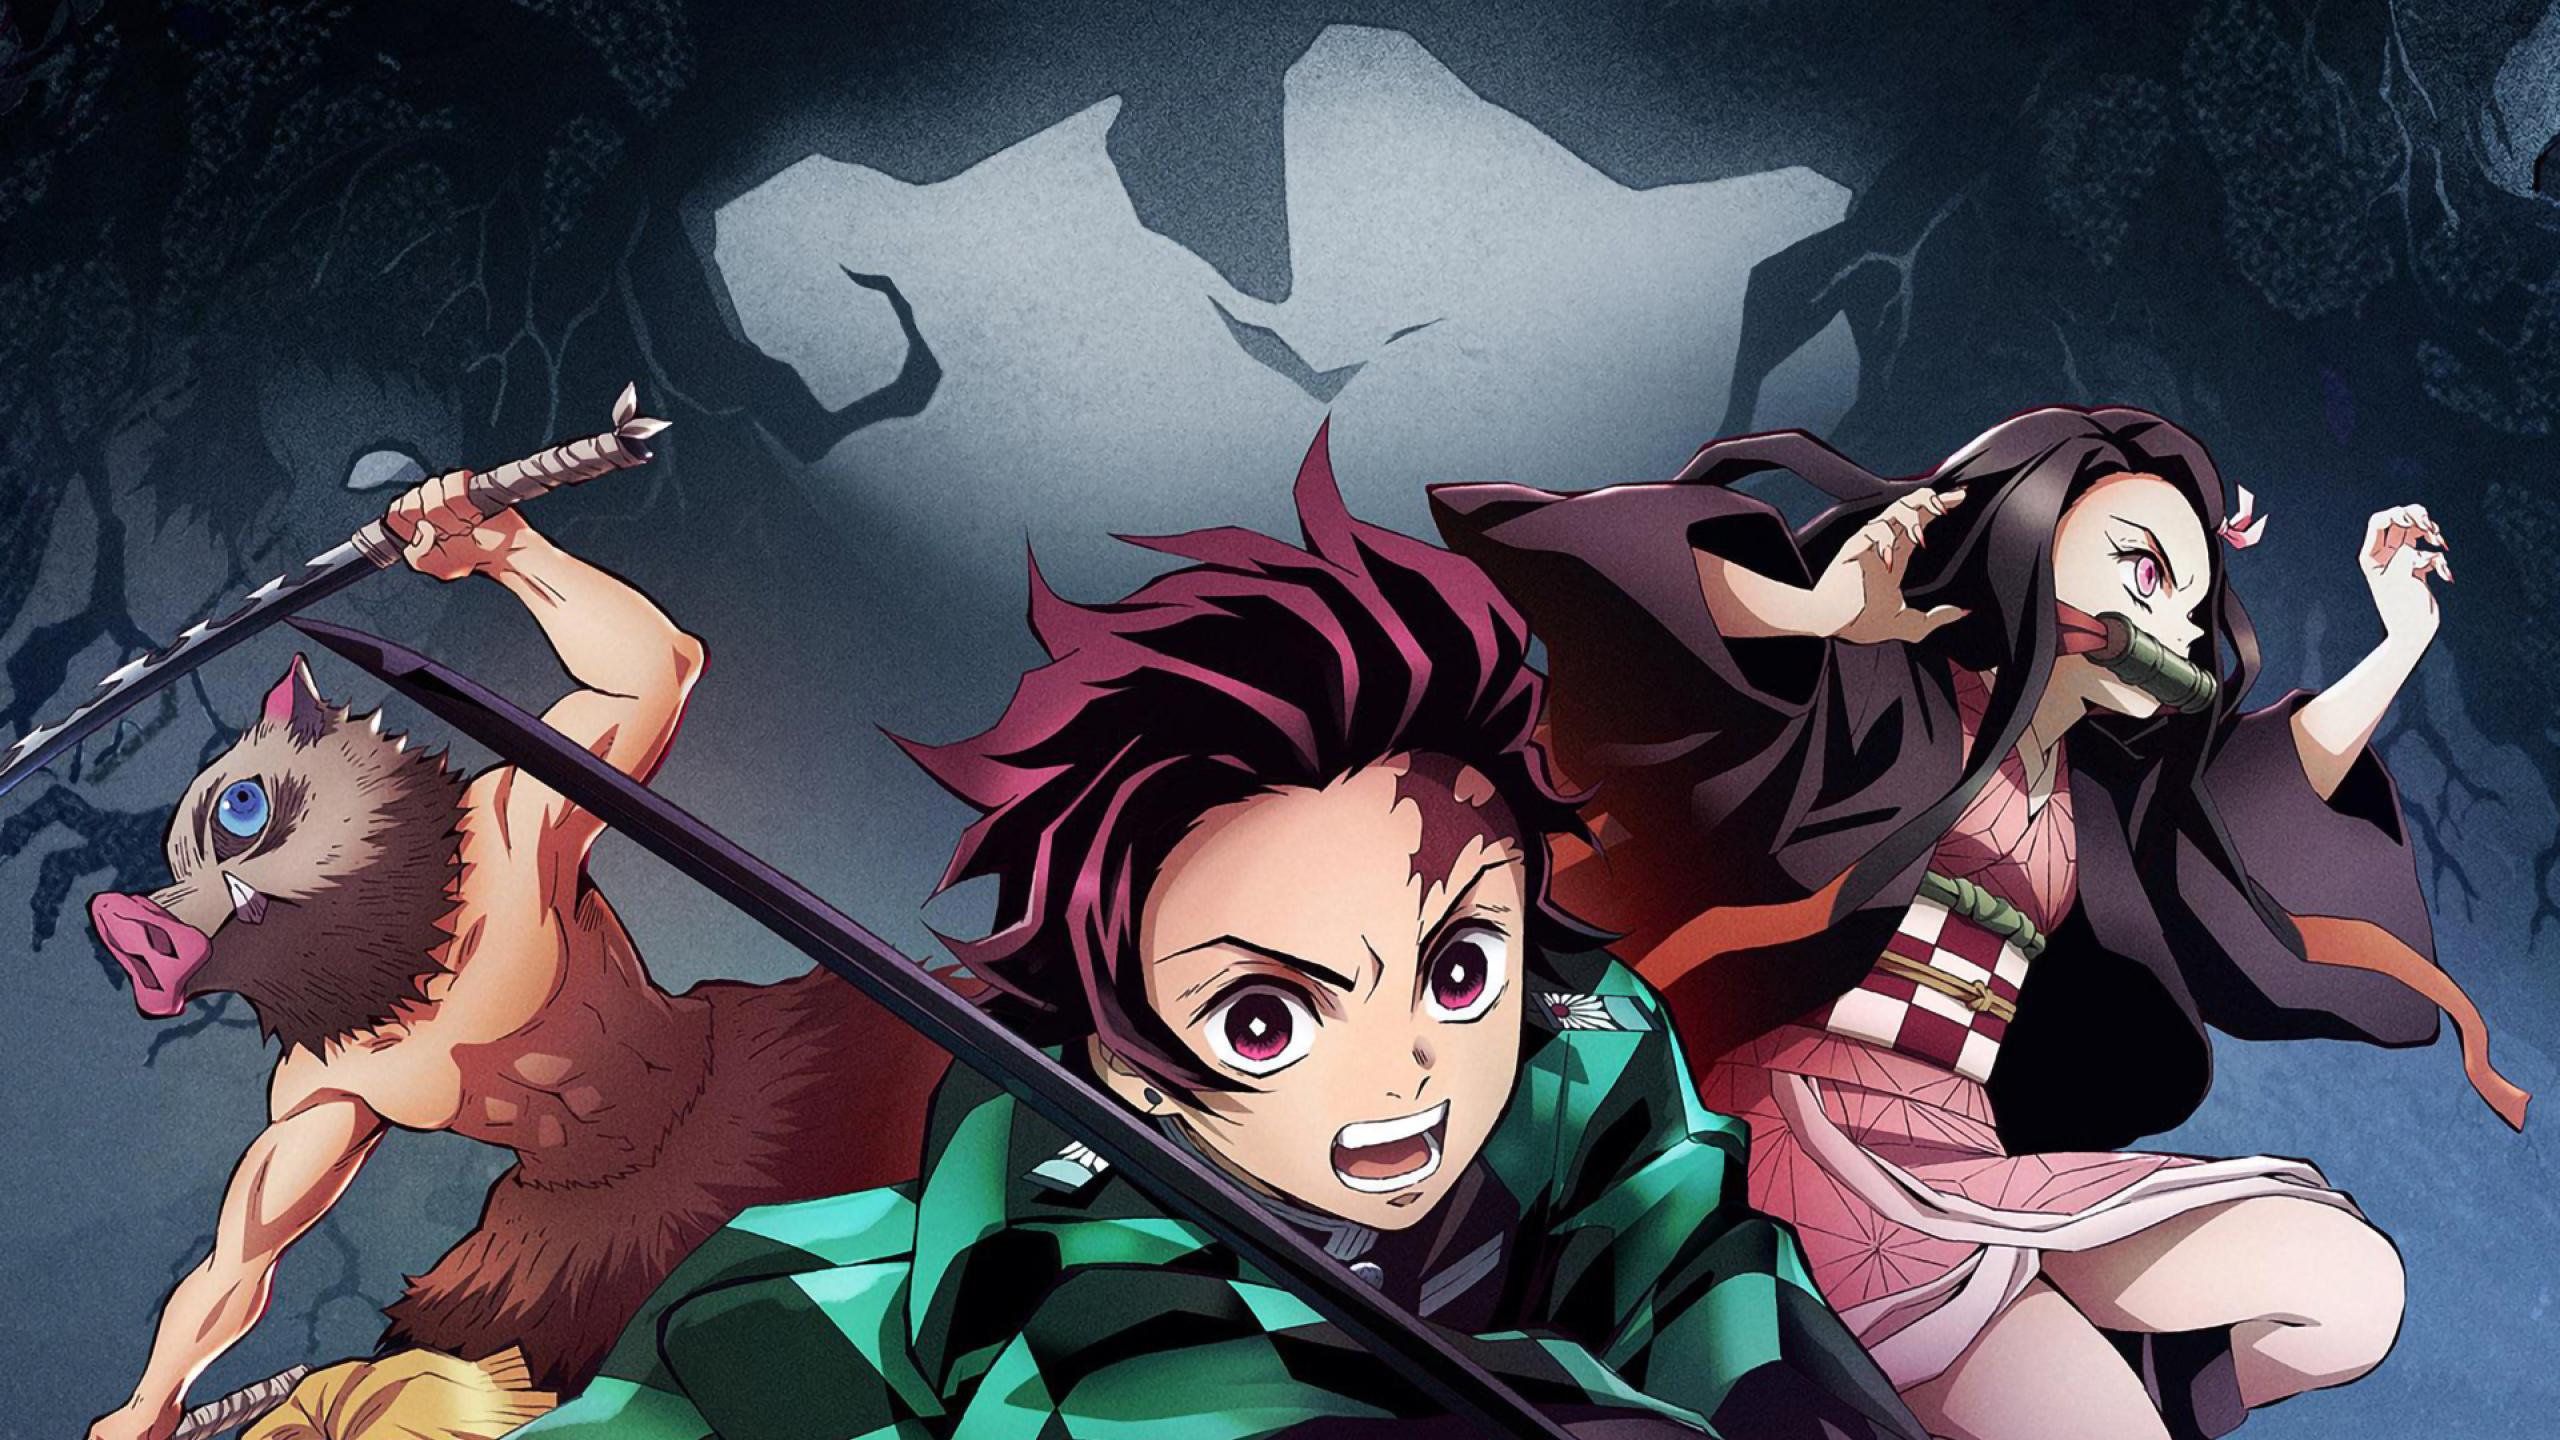 2560x1440 Demon Slayer 1440p Resolution Wallpaper Hd Anime